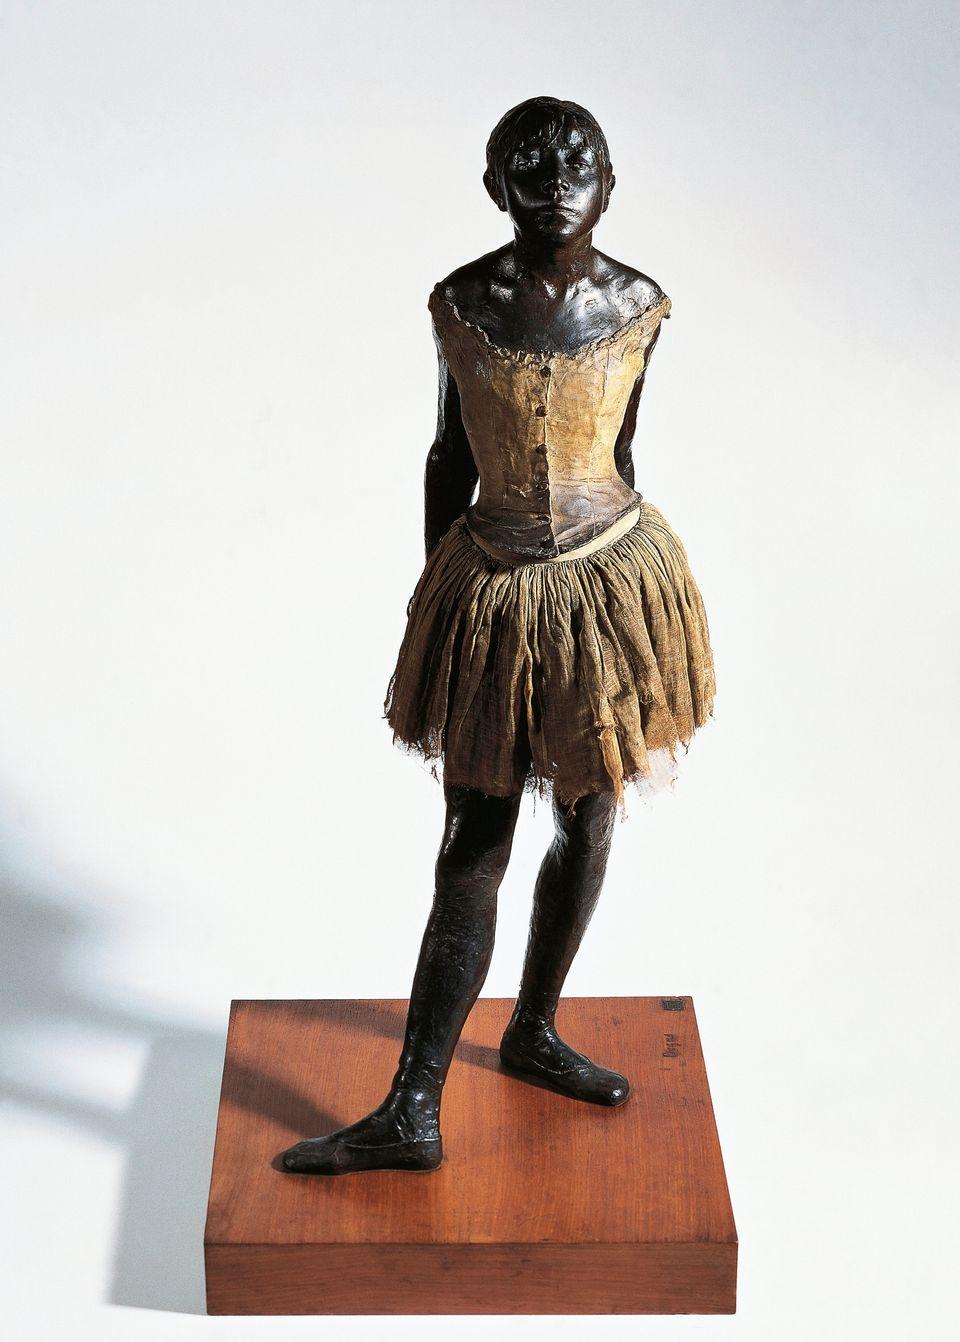 Author Camille Laurens explores the relationship between Degas and van Goethem in her bookLittle...